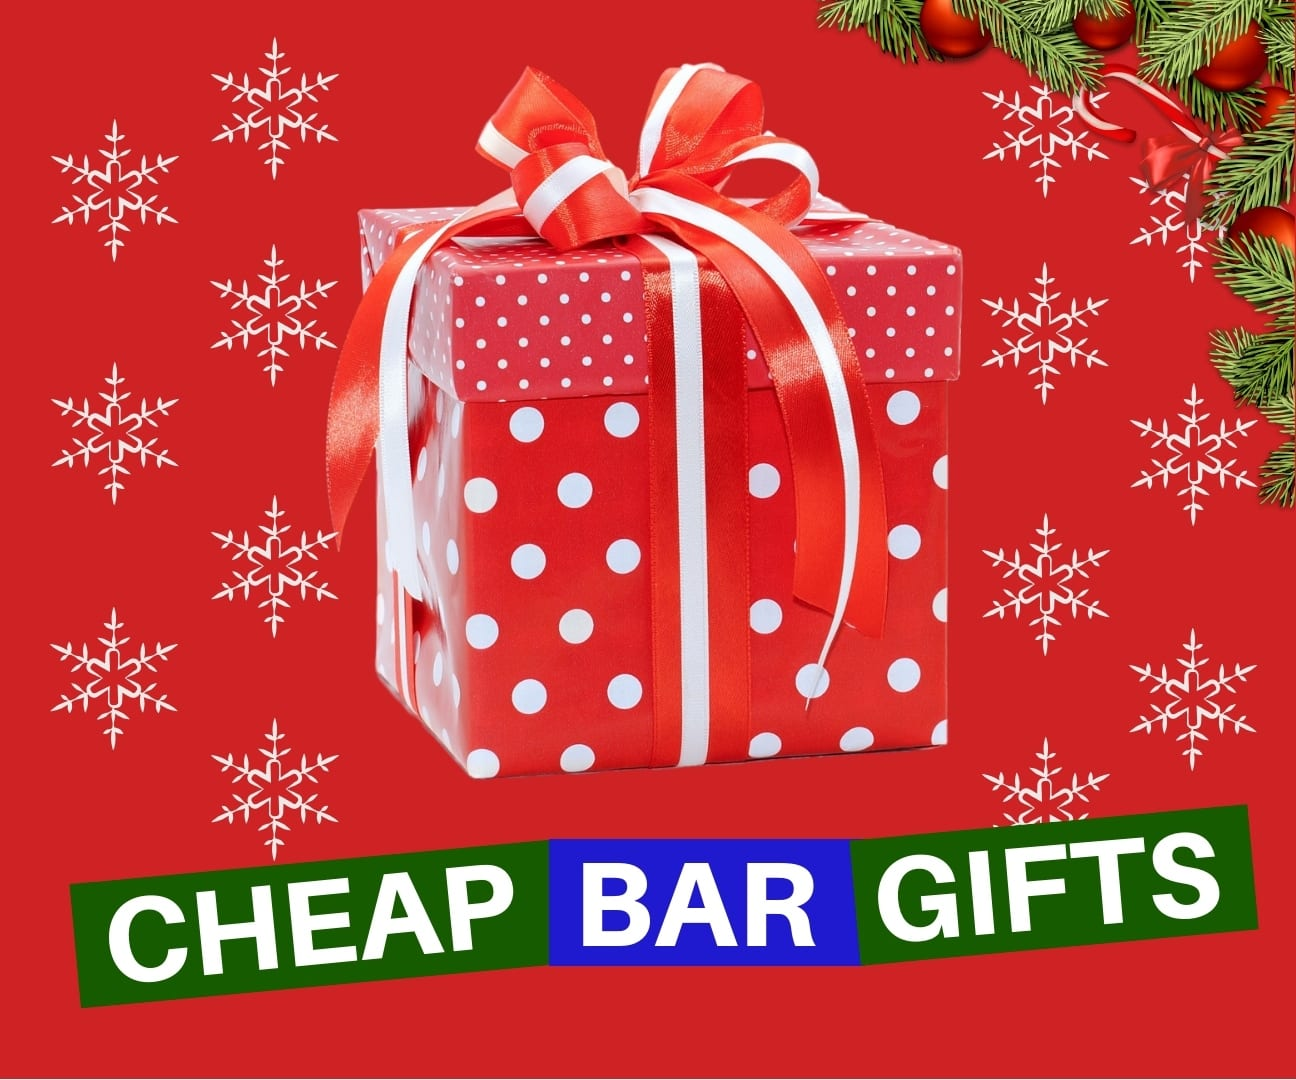 Cheap Christmas bar gifts